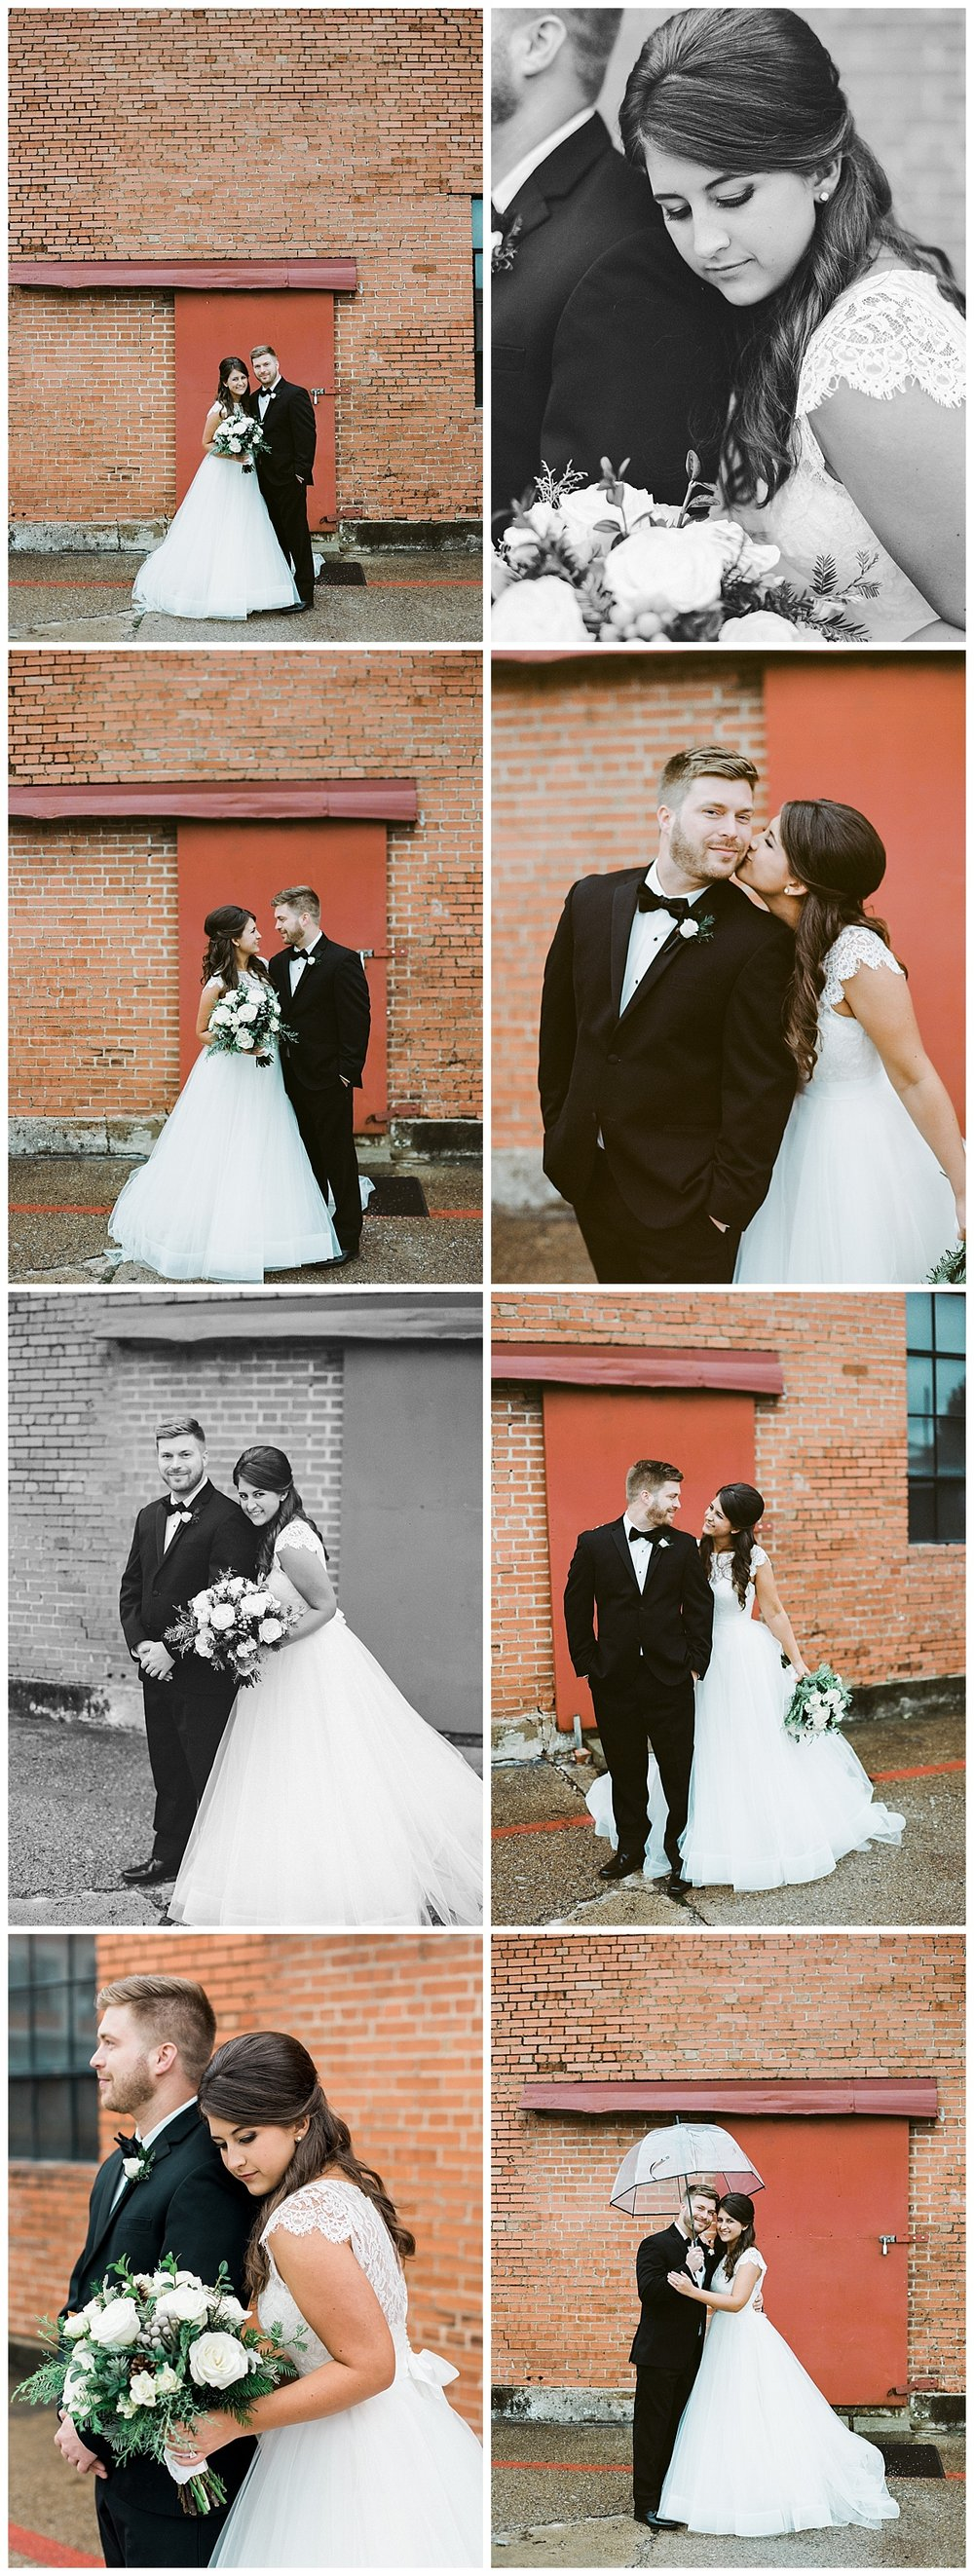 hickory-street-annex-wedding-ar-photography-6.jpg